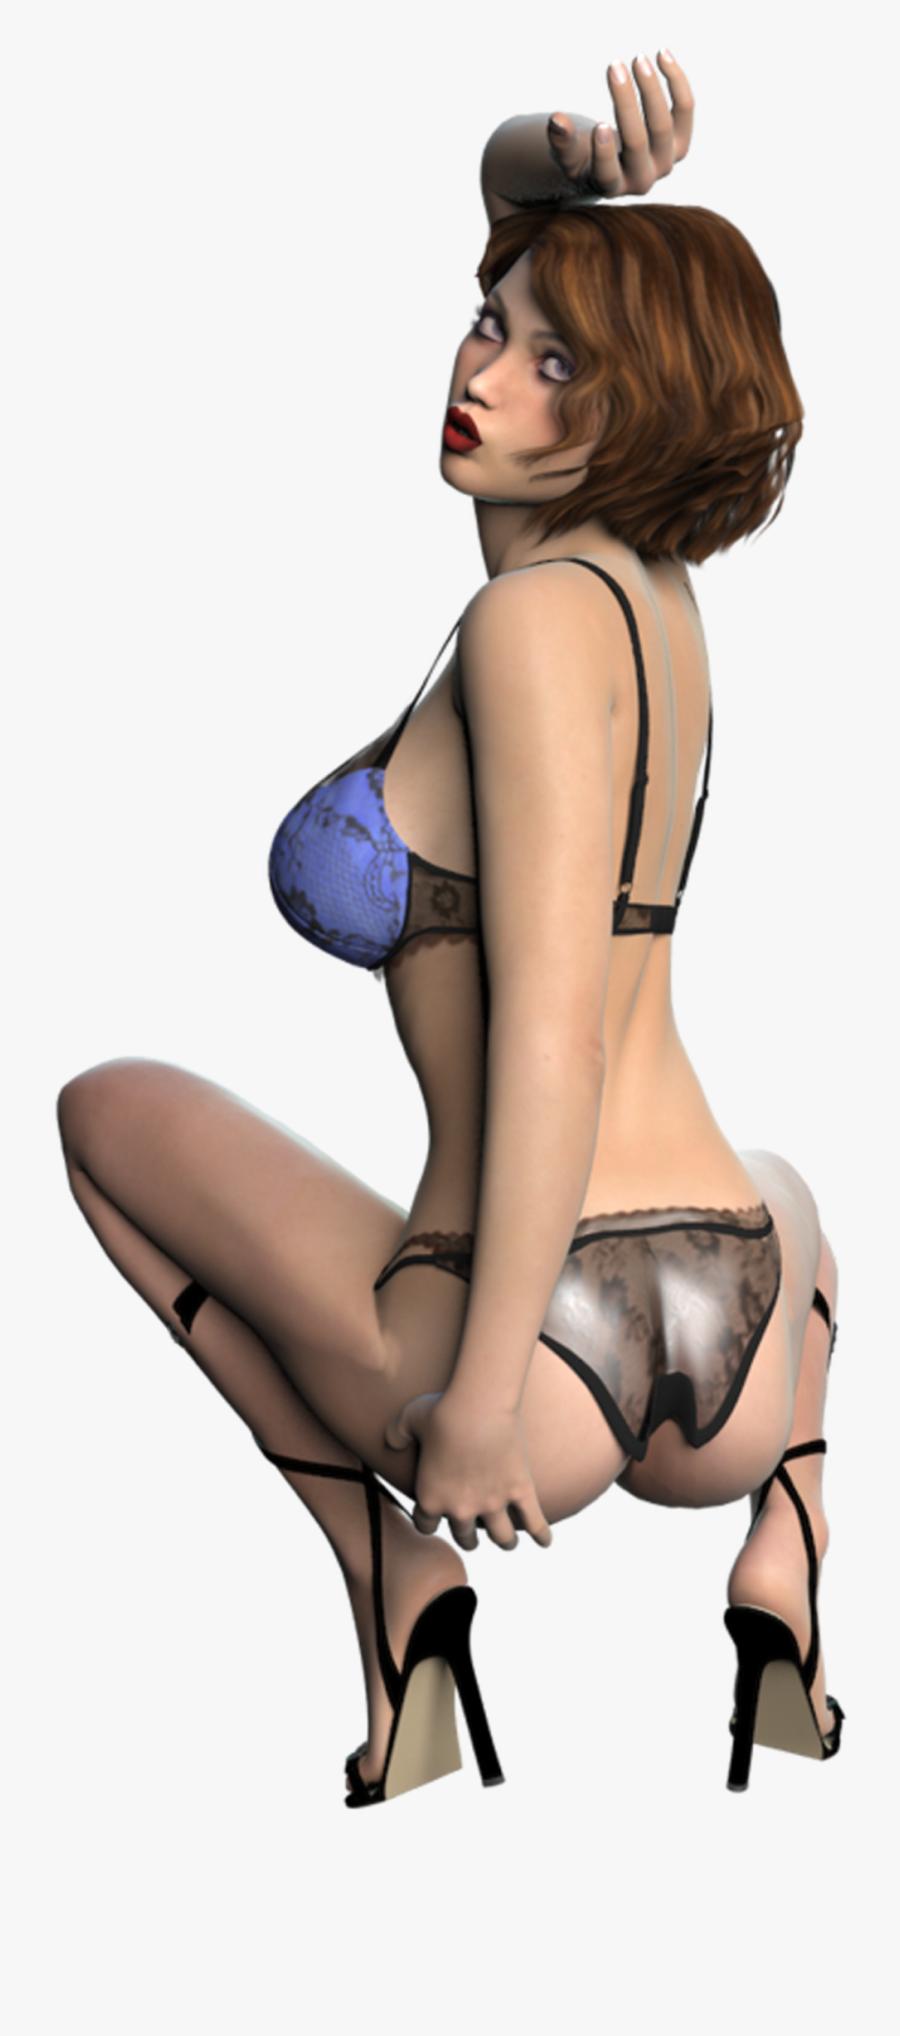 Sexy Girl Women Lingerie Female - Lingerie Top, Transparent Clipart